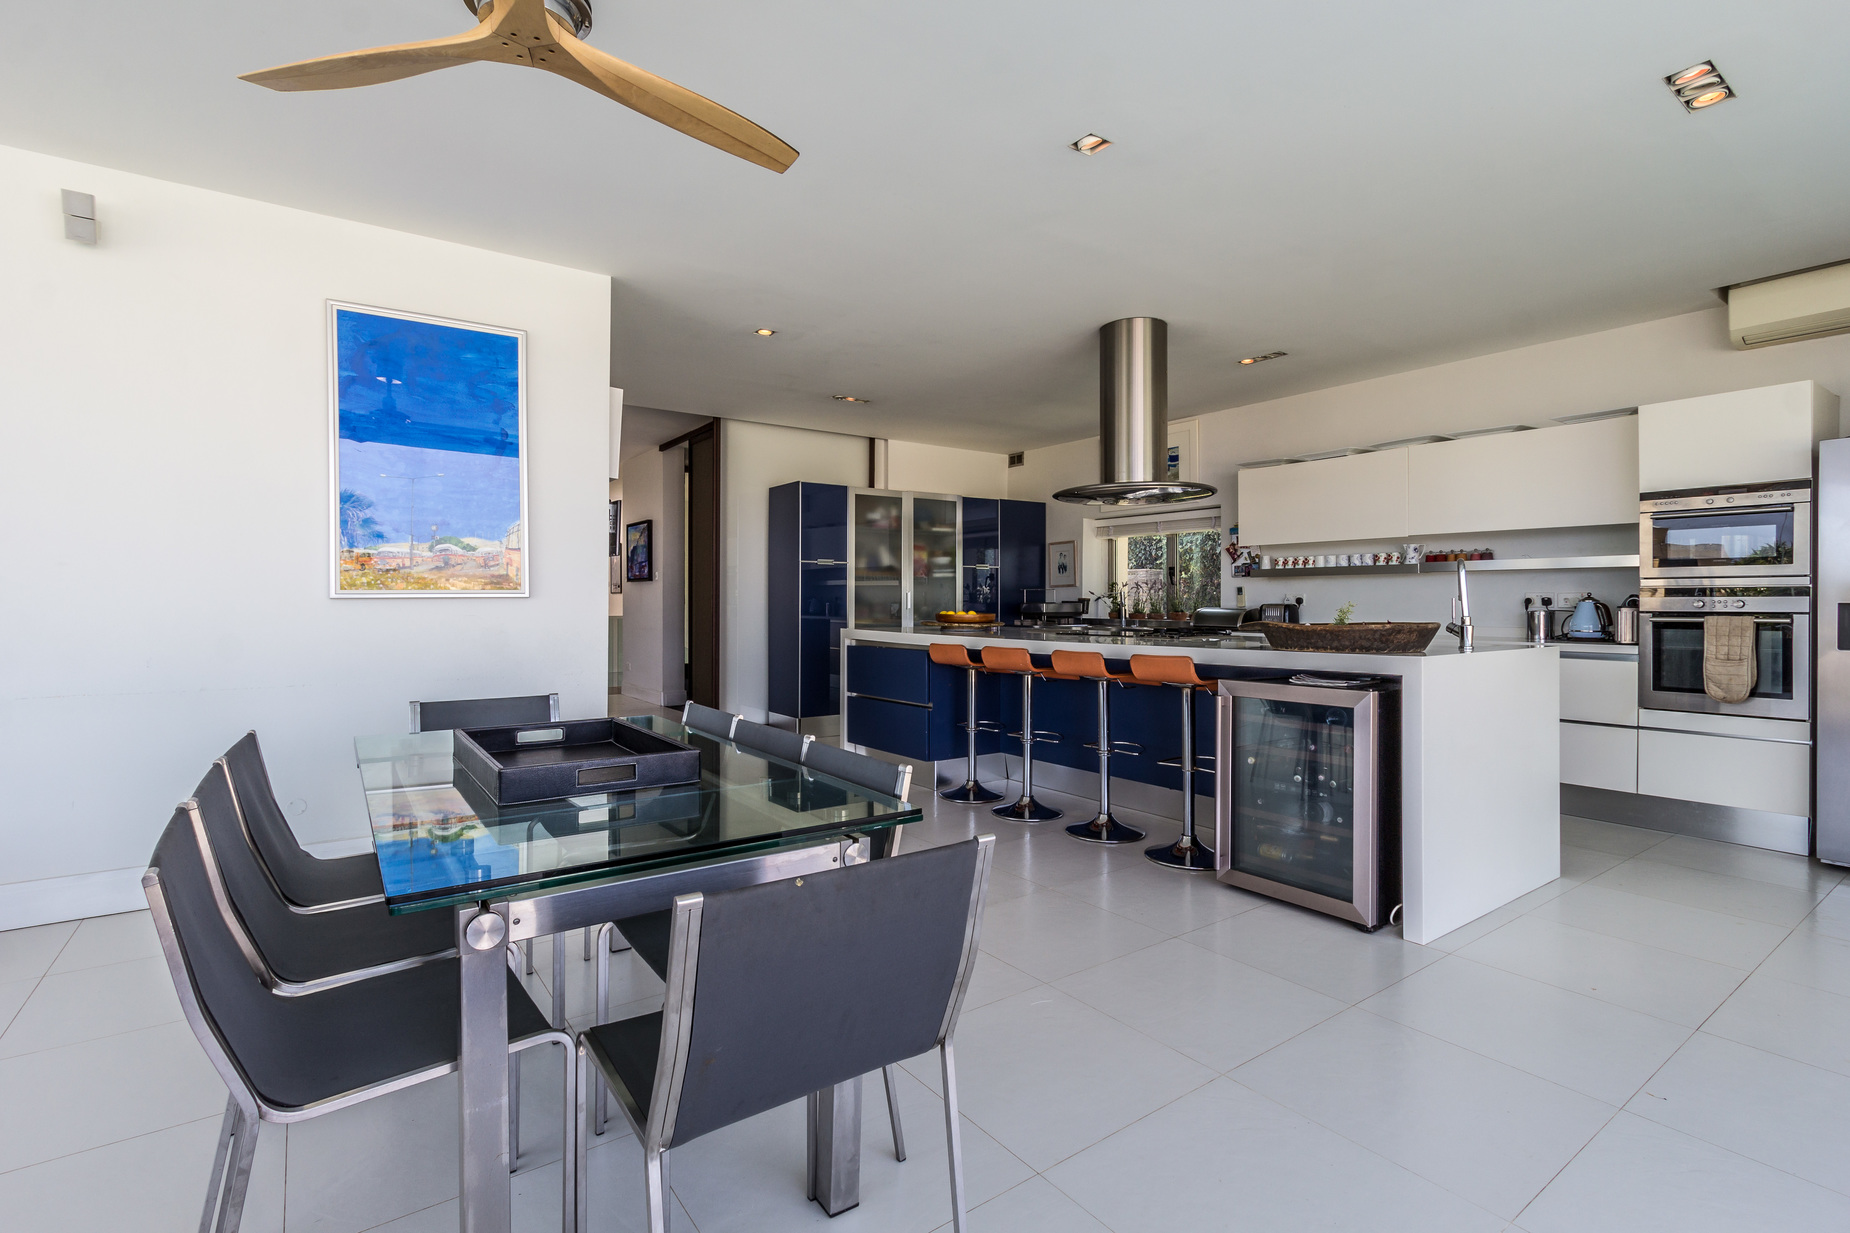 7 bed Villa For Sale in Bahar ic-Caghaq, Bahar ic-Caghaq - thumb 13